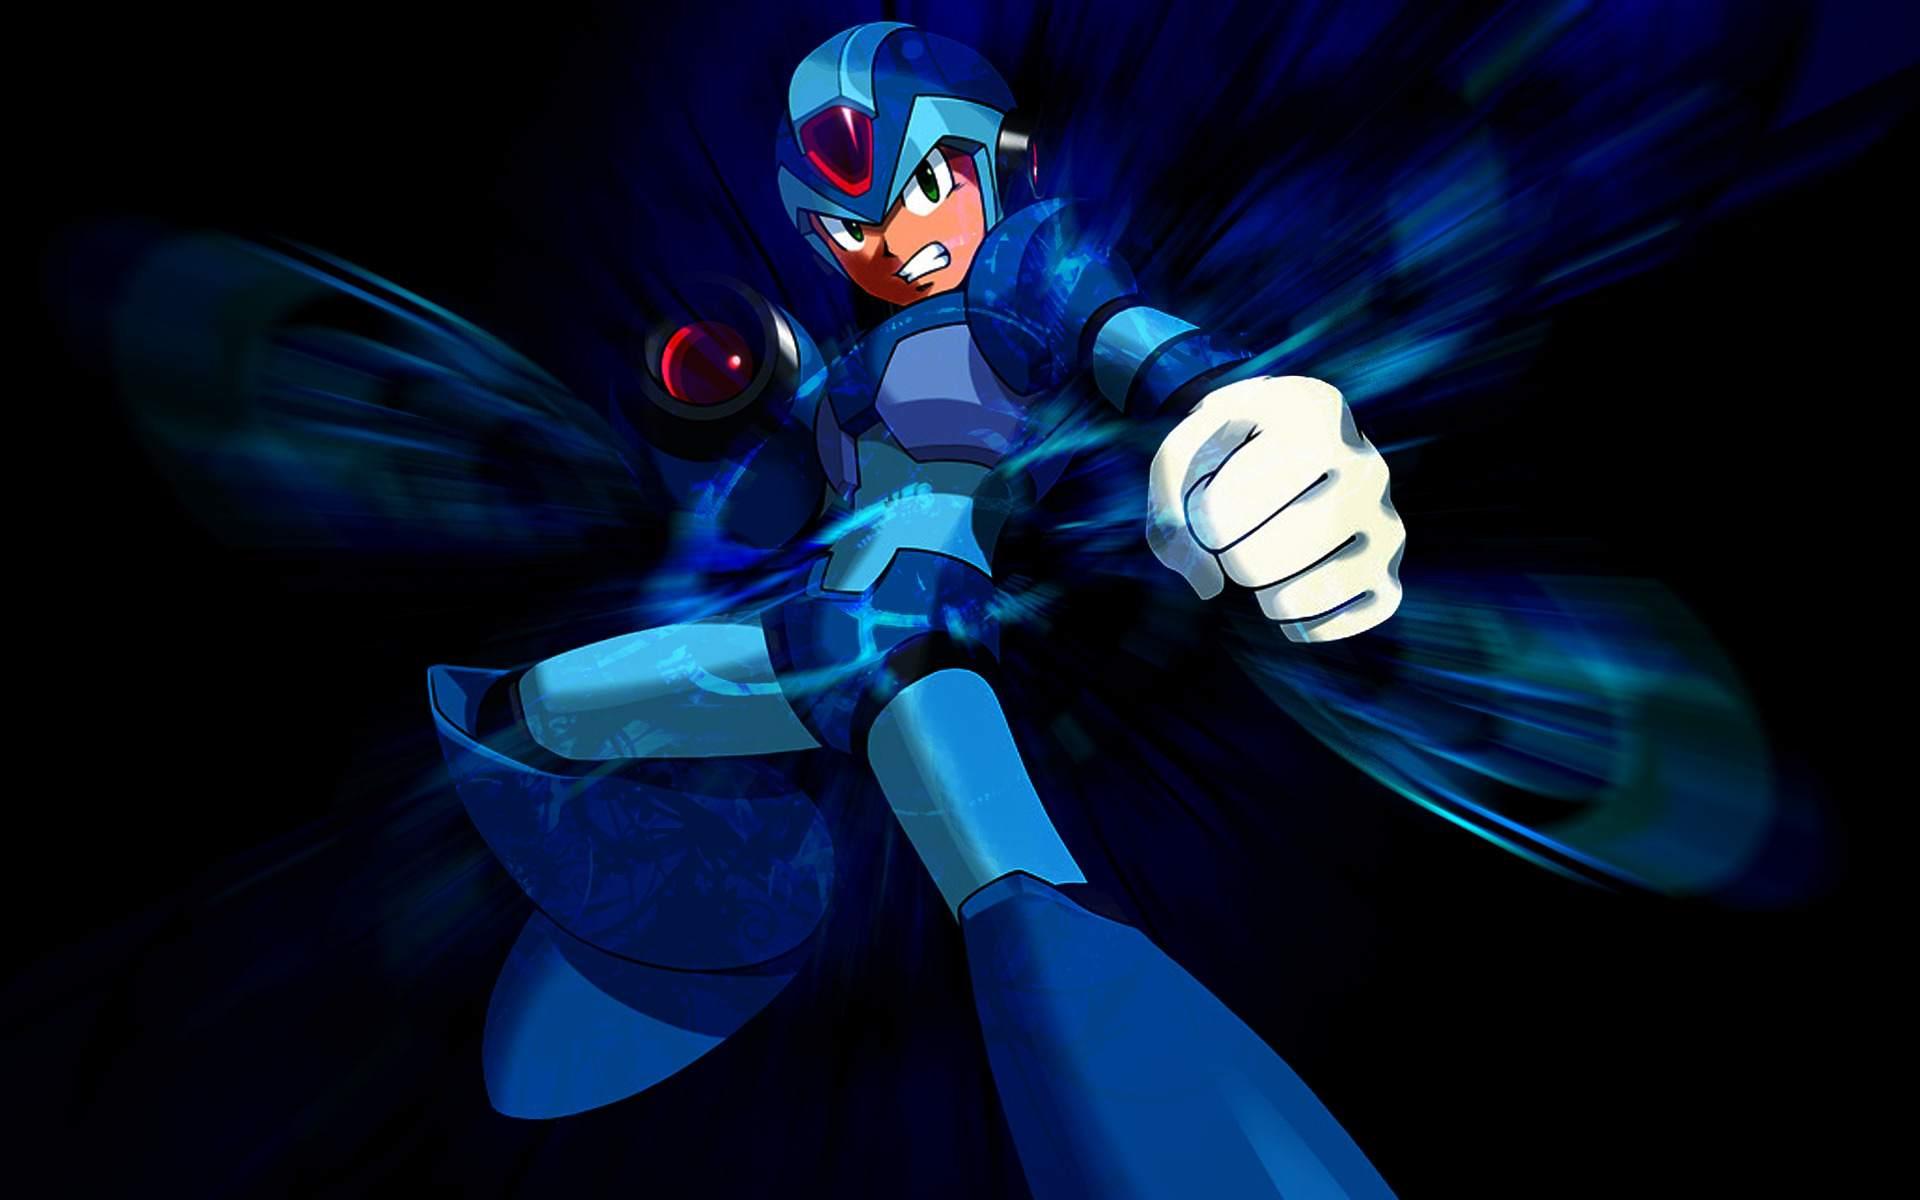 Awesome commemorative statue for Mega Man